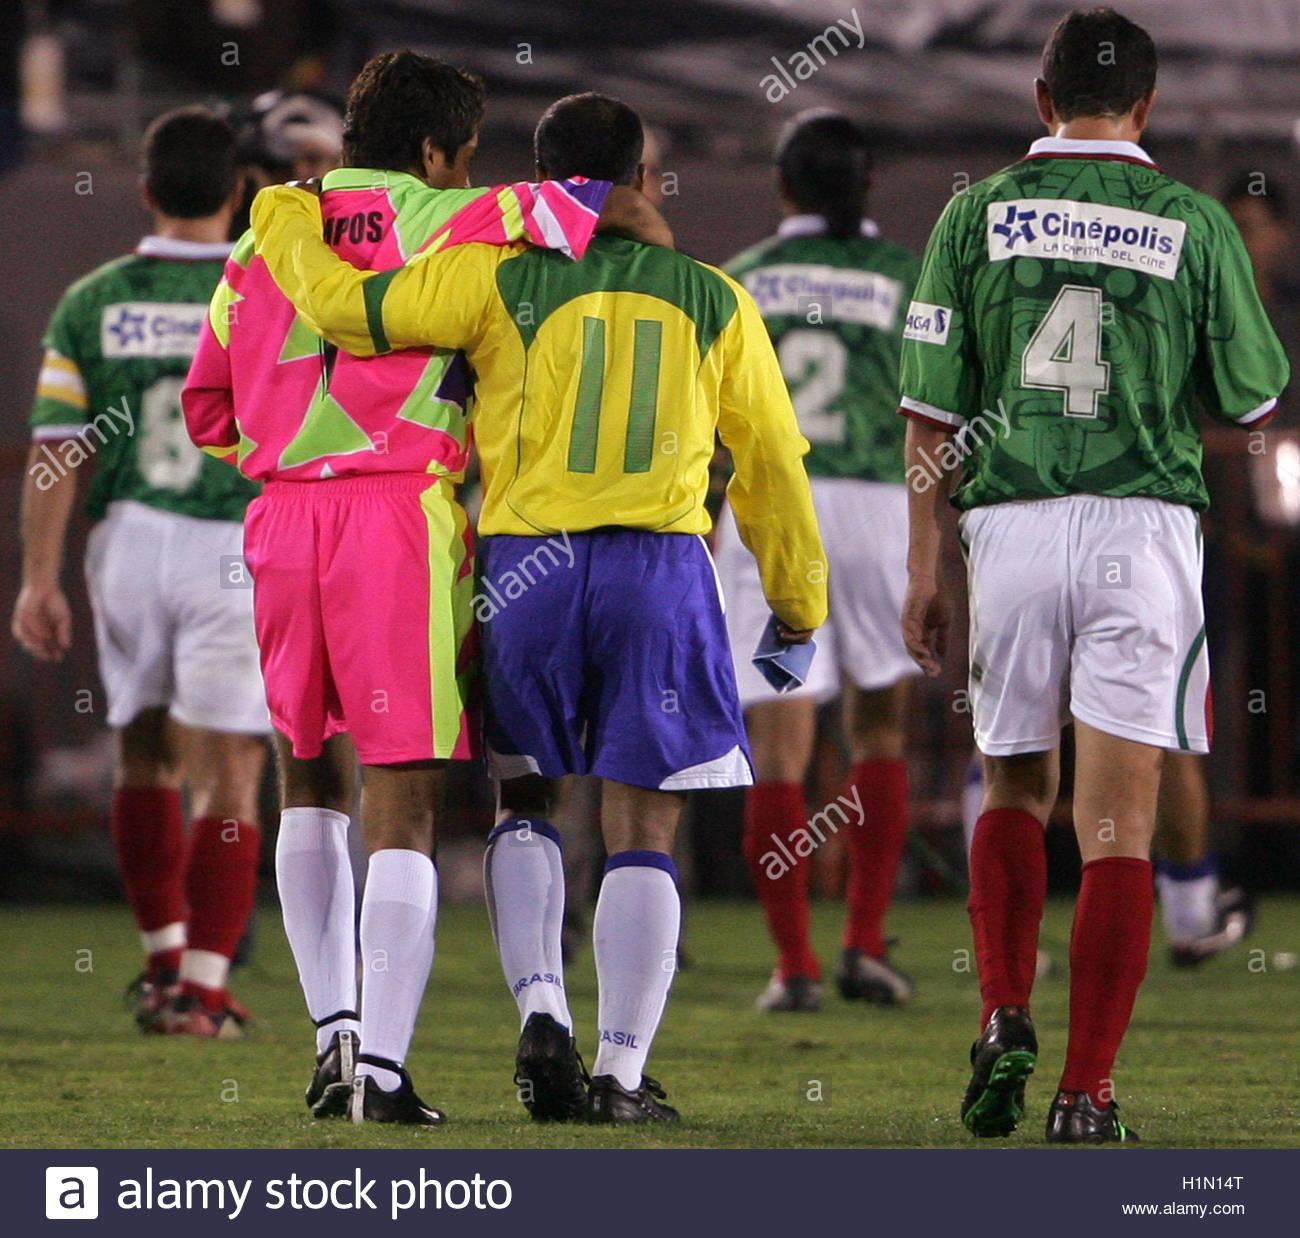 ¿Cuánto mide Jorge Campos? (El Brody) - Real height Brazilian-soccer-star-romario-de-souza-faria-and-mexican-goalkeeper-H1N14T